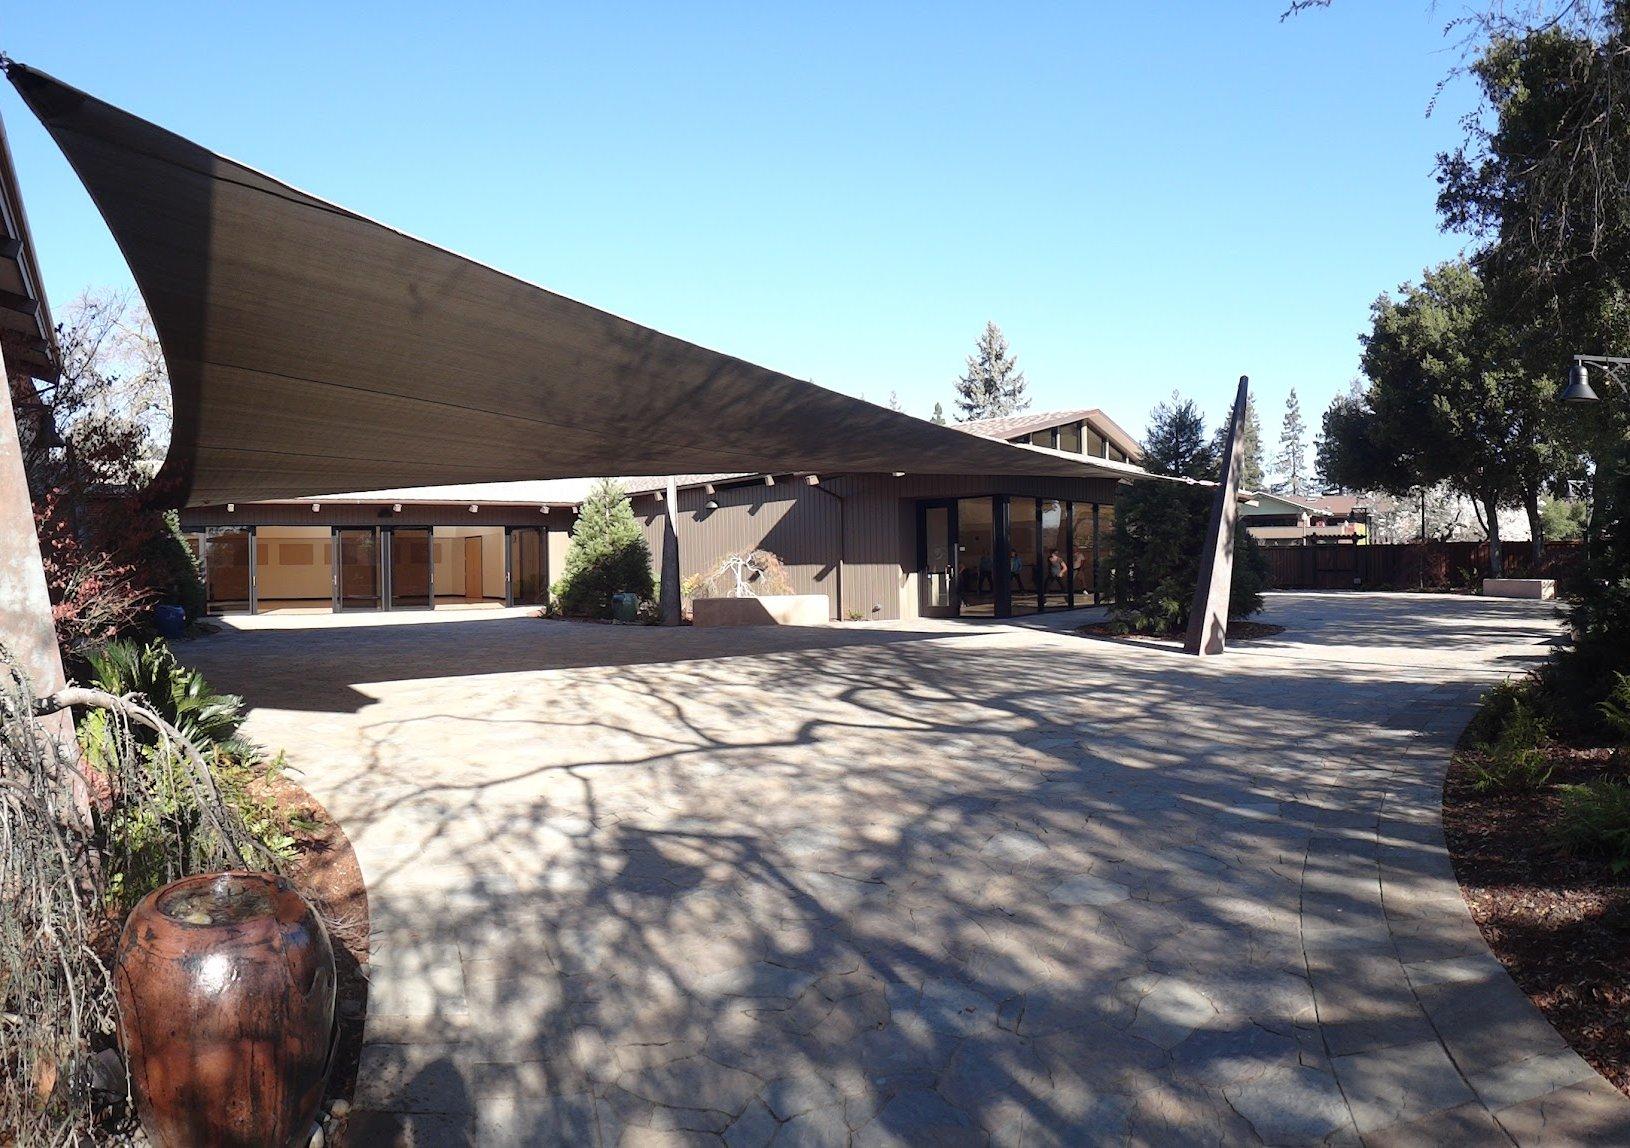 Arrillaga Family Recreation Center   Facility Rental Information · Burgess  Patio Conceptual Plan · Facility Rental Checklist · Facility Rental Contract